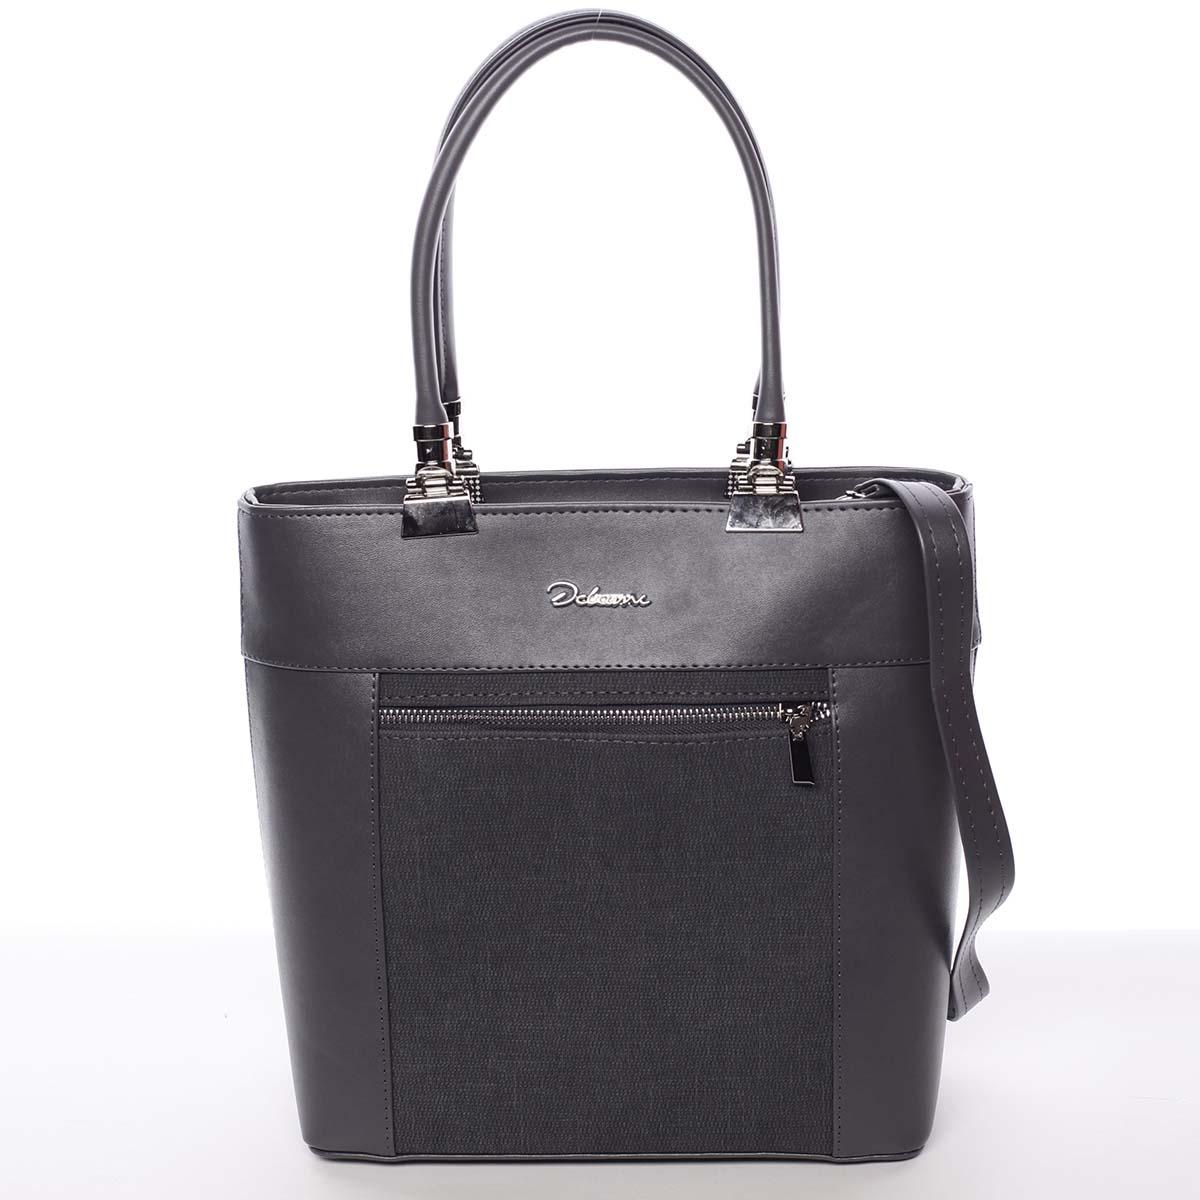 Elegantná dámska kabelka sivá - Delami Kassandra